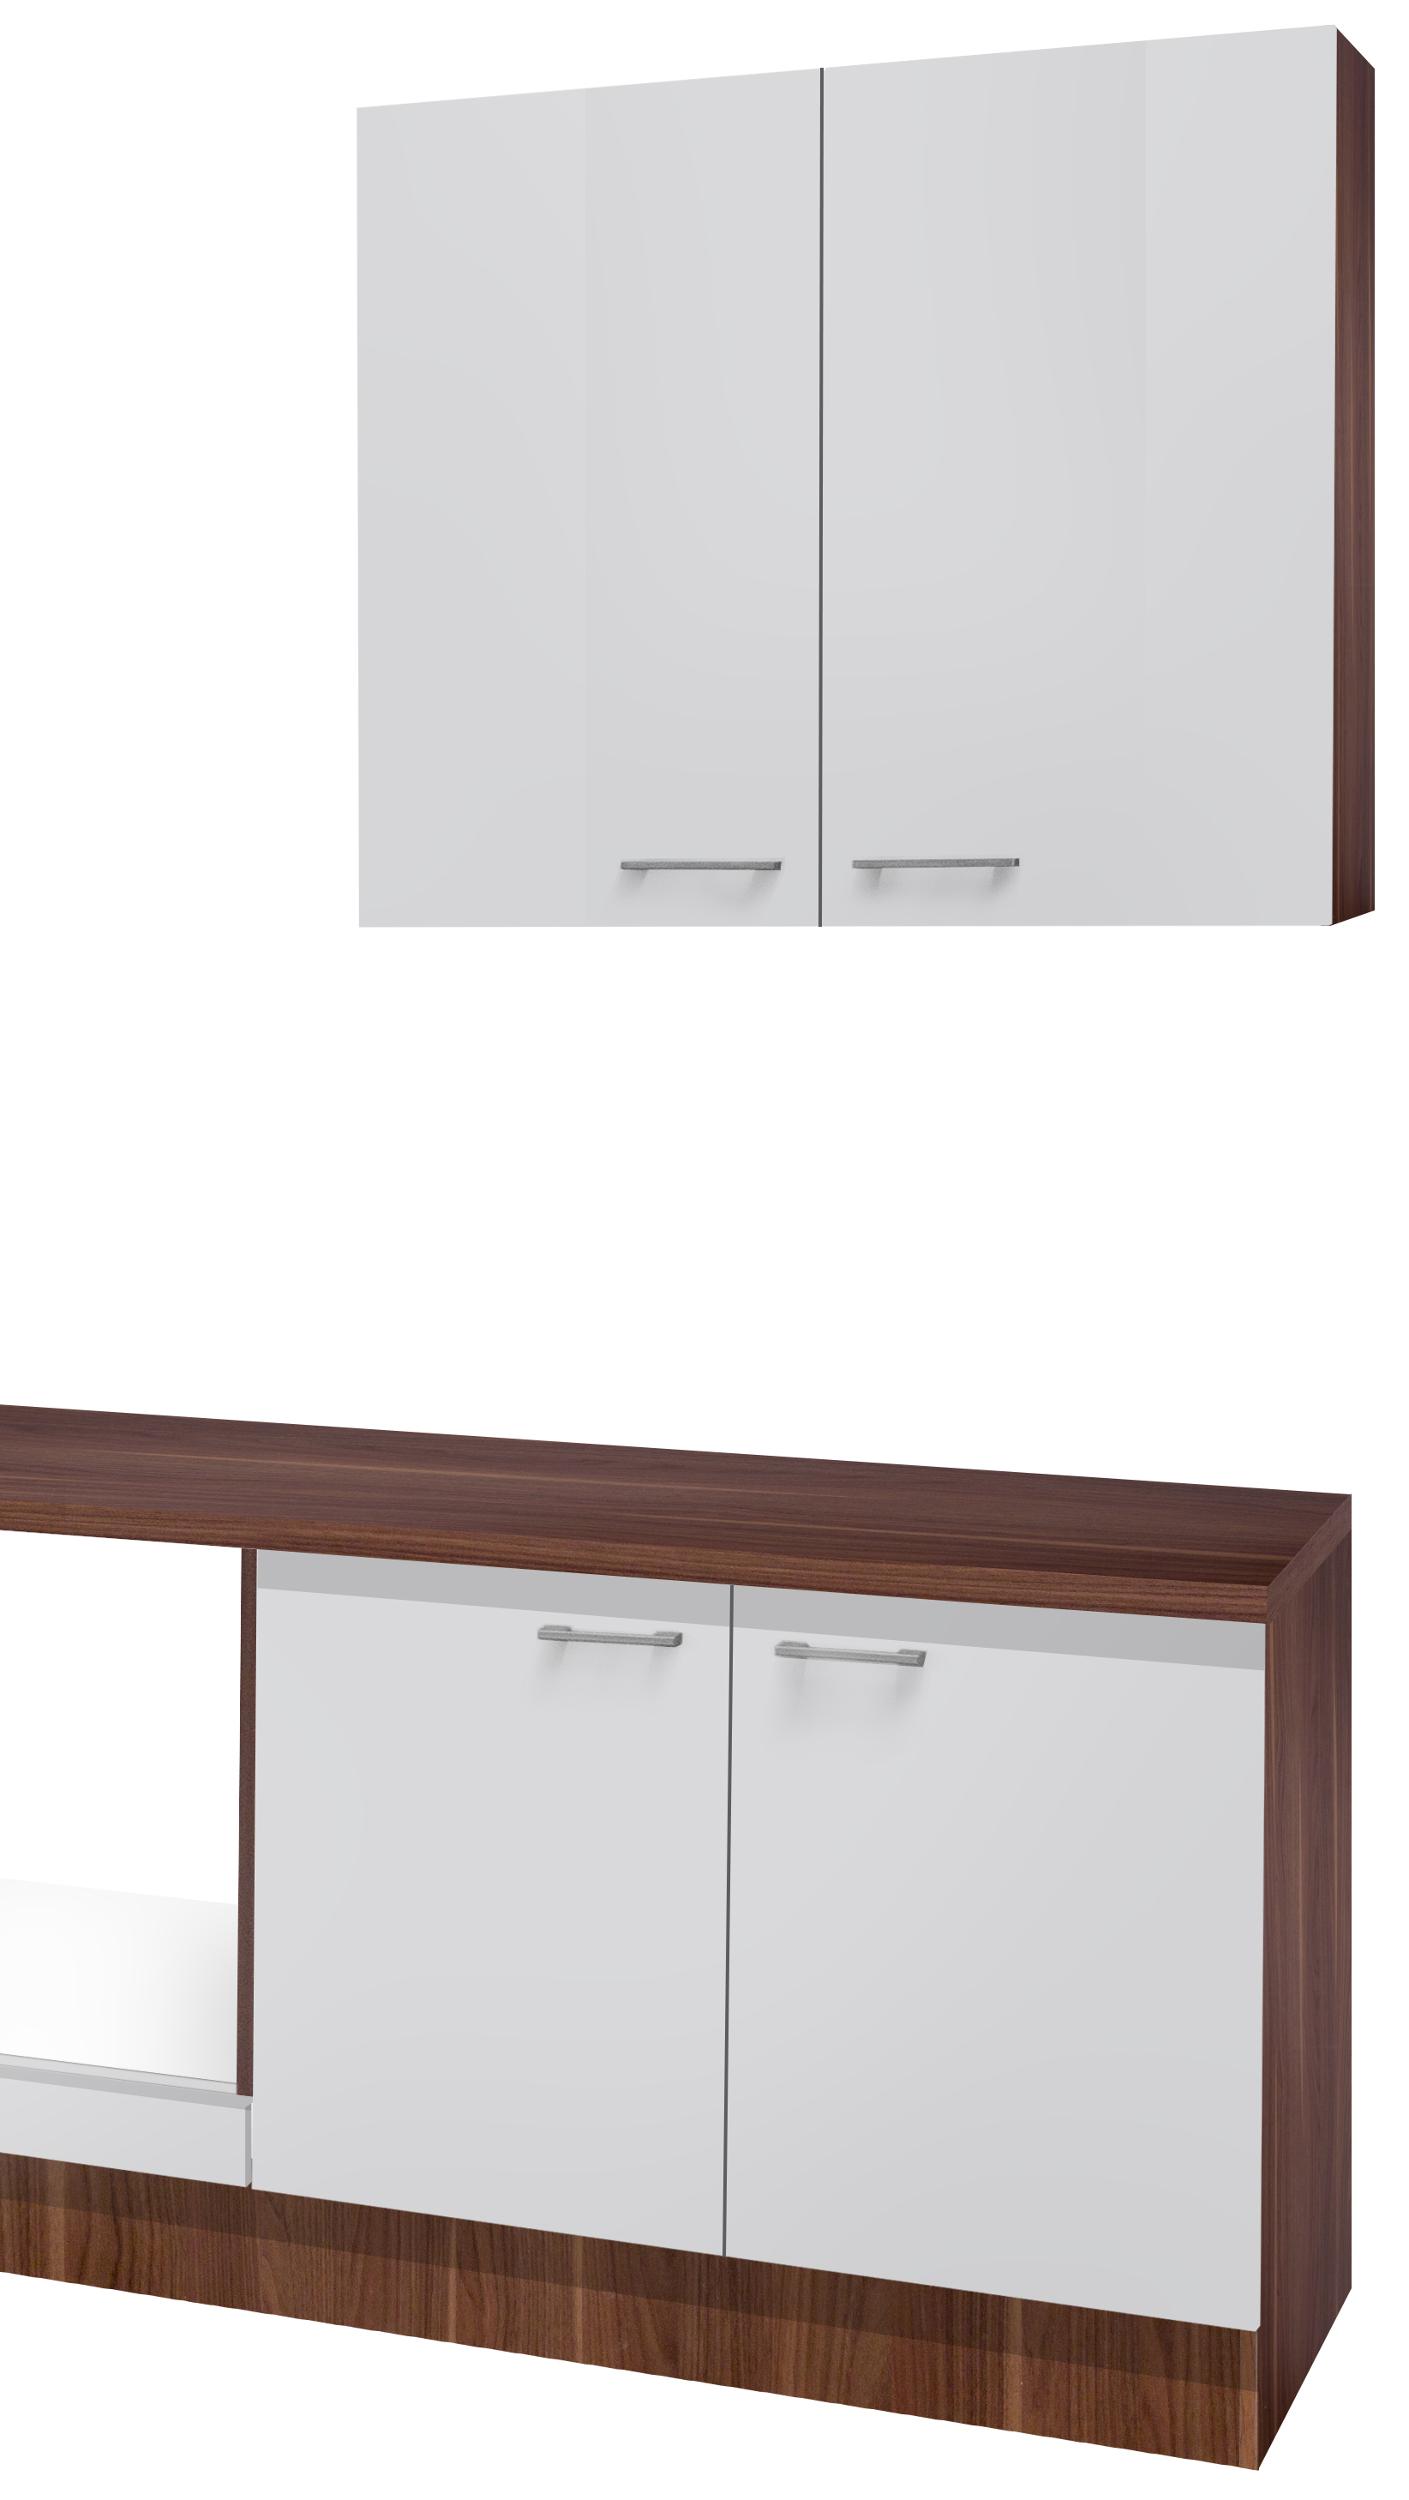 einbauk che cosmo k chenzeile k chenblock ohne e ger te leerblock 280 cm weiss ebay. Black Bedroom Furniture Sets. Home Design Ideas